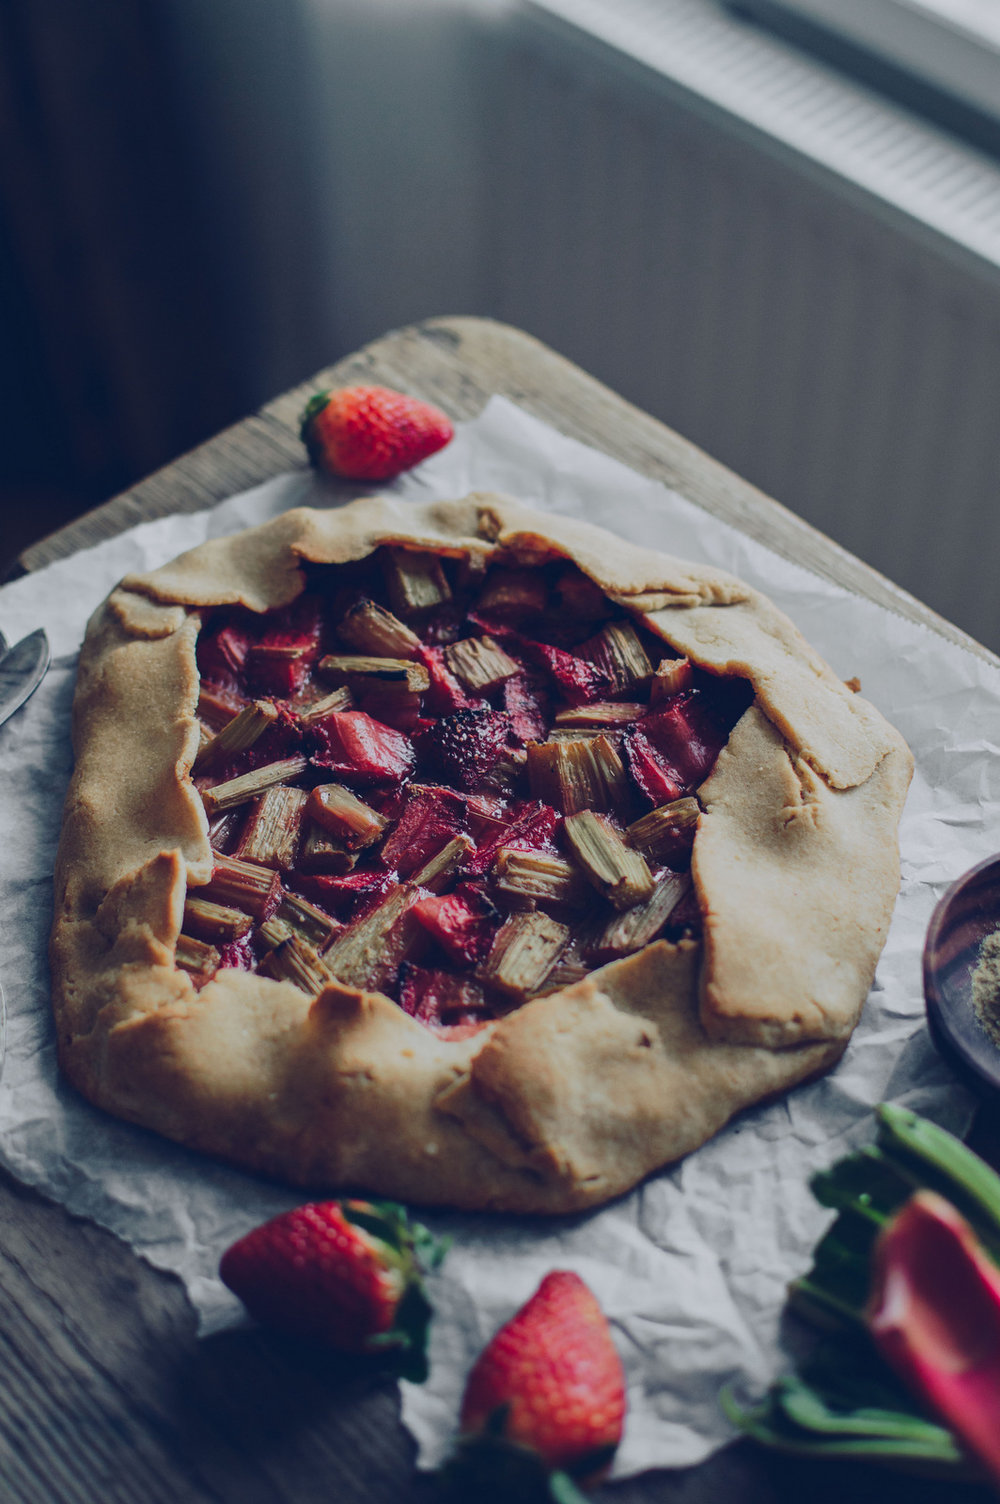 Vegan & glutenfree Strawberry & rhubarb galette | The Nordic Kitchen